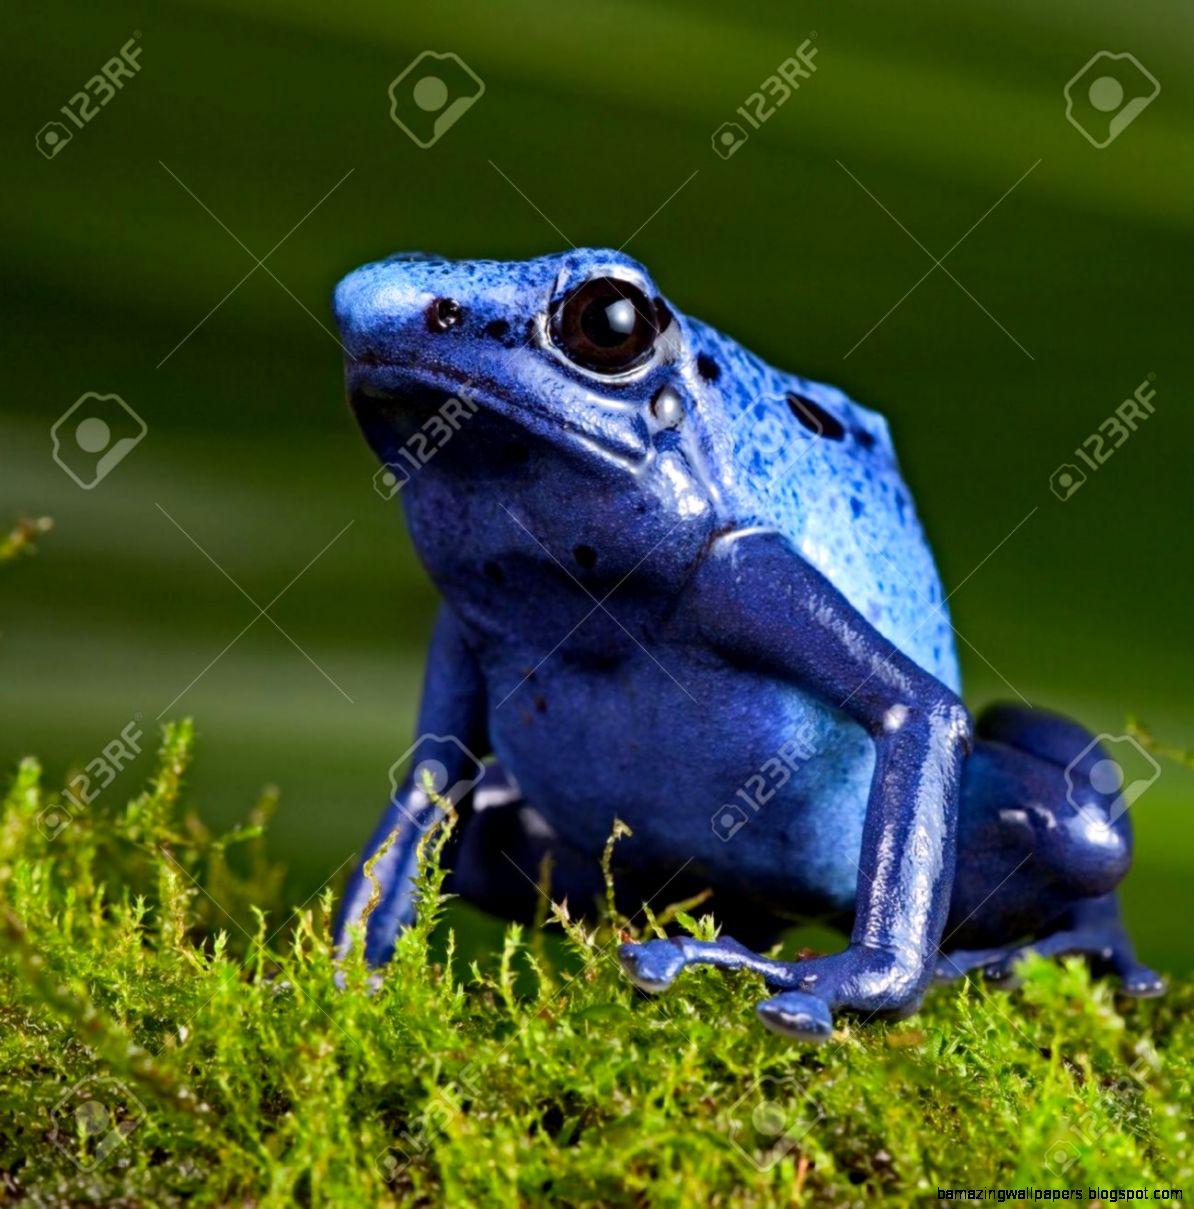 Blue Poison Dart Frog Poisonous Animal Of Amazon Rainforest